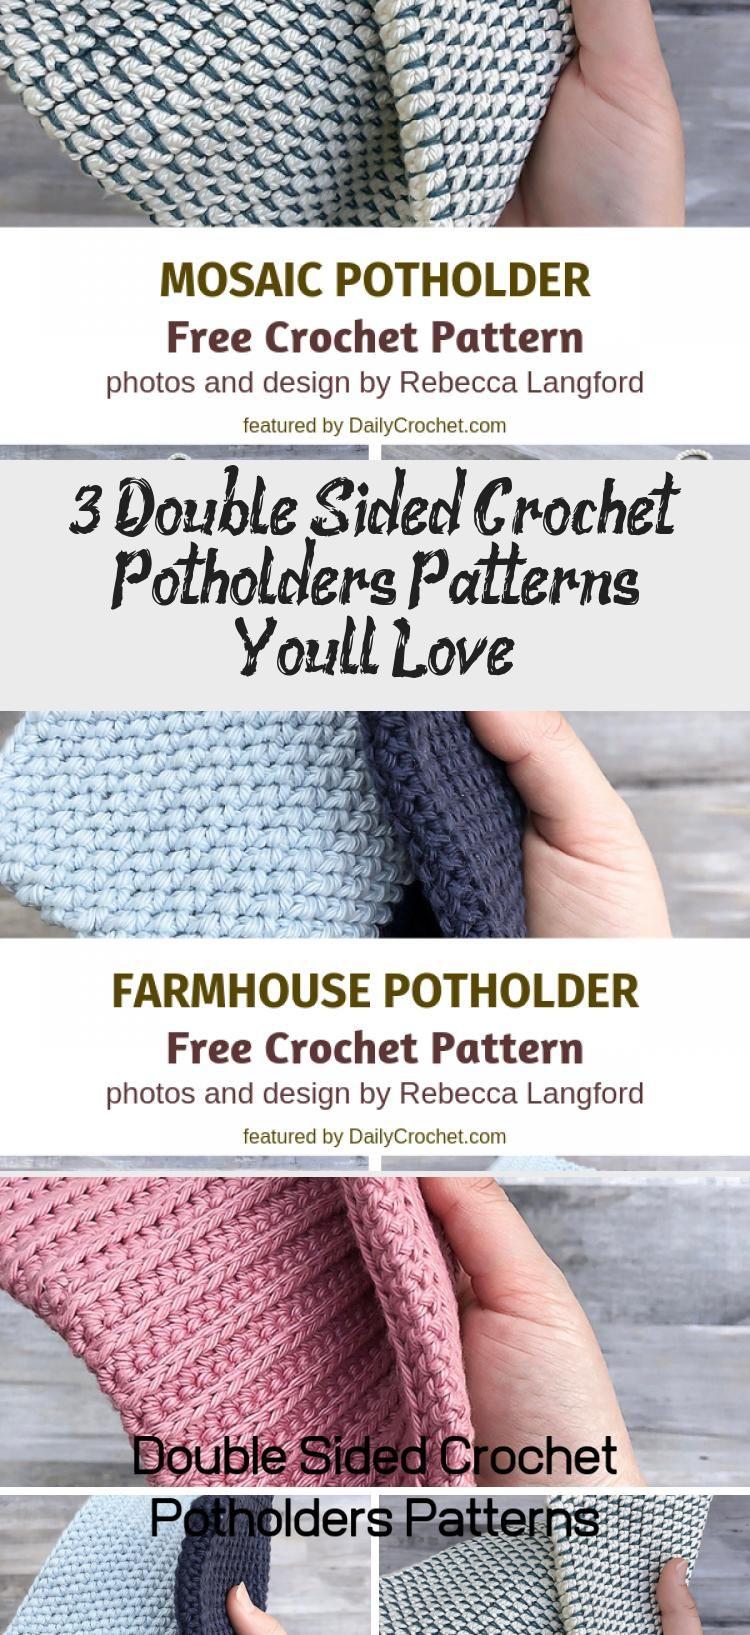 3 Double Sided Crochet Potholders Patterns You'll Love   Crochet ...